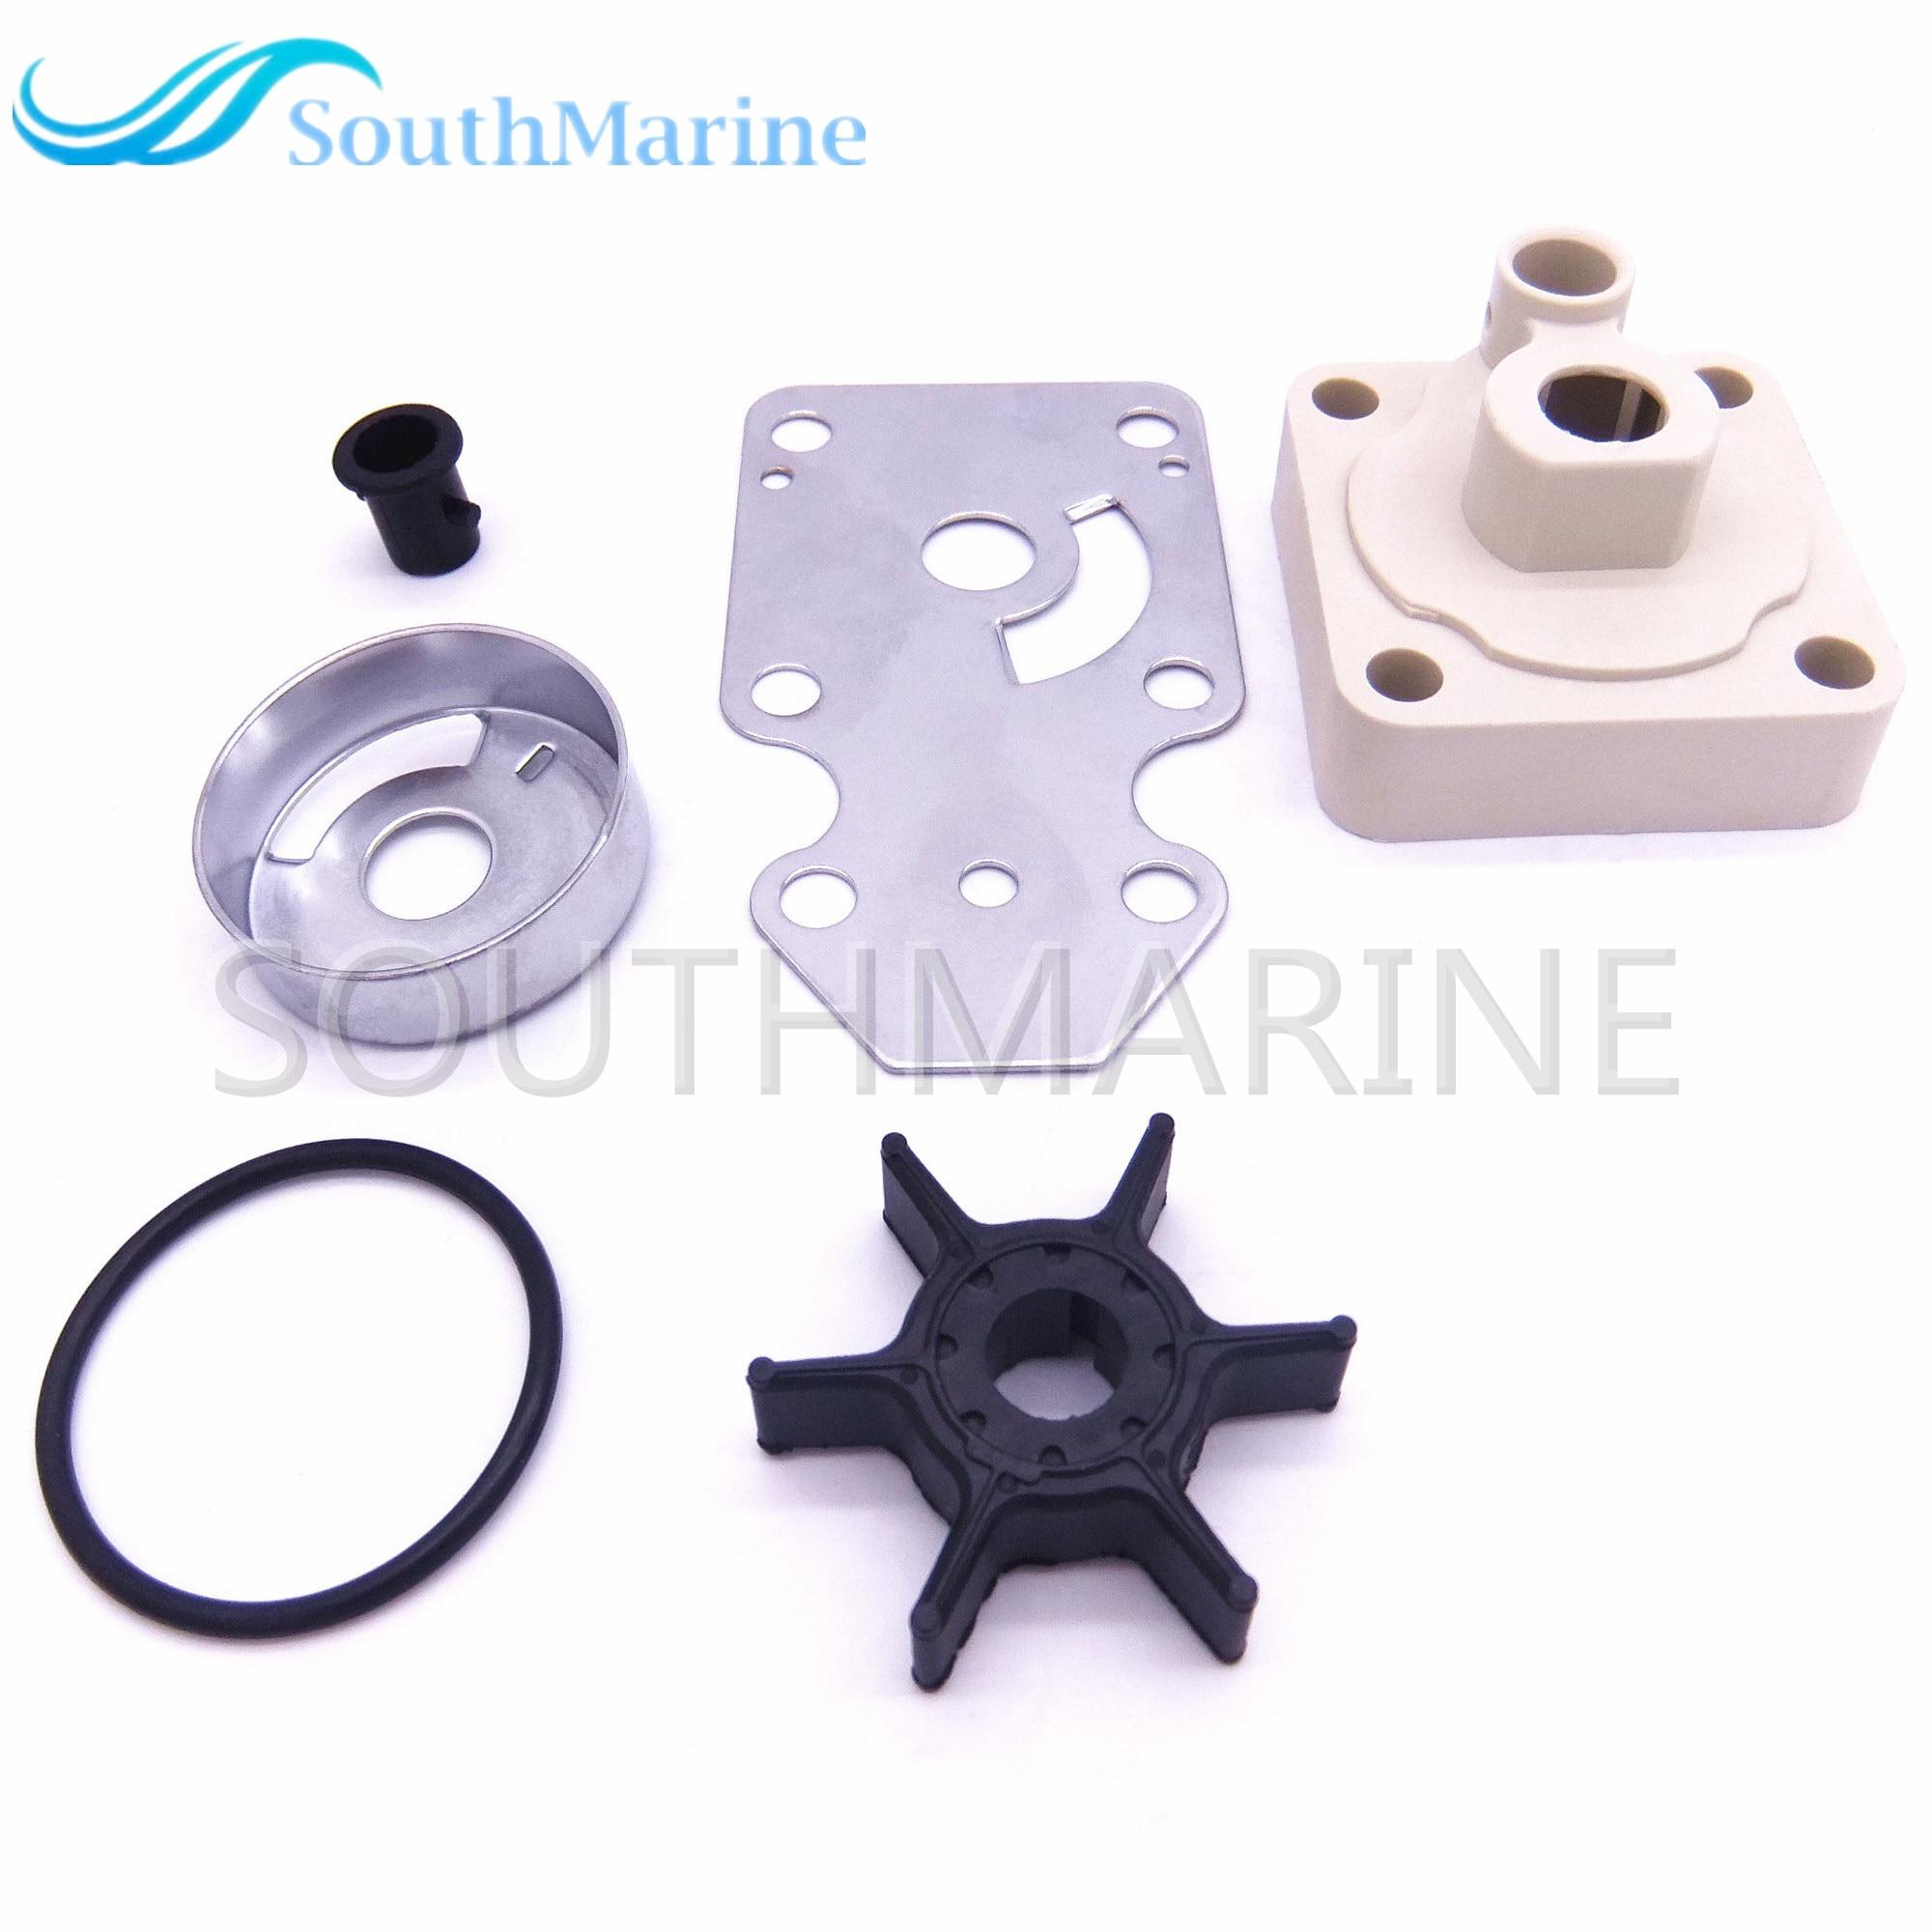 Water Pump Kit For Parsun HDX F4 F5 BM outboard motors